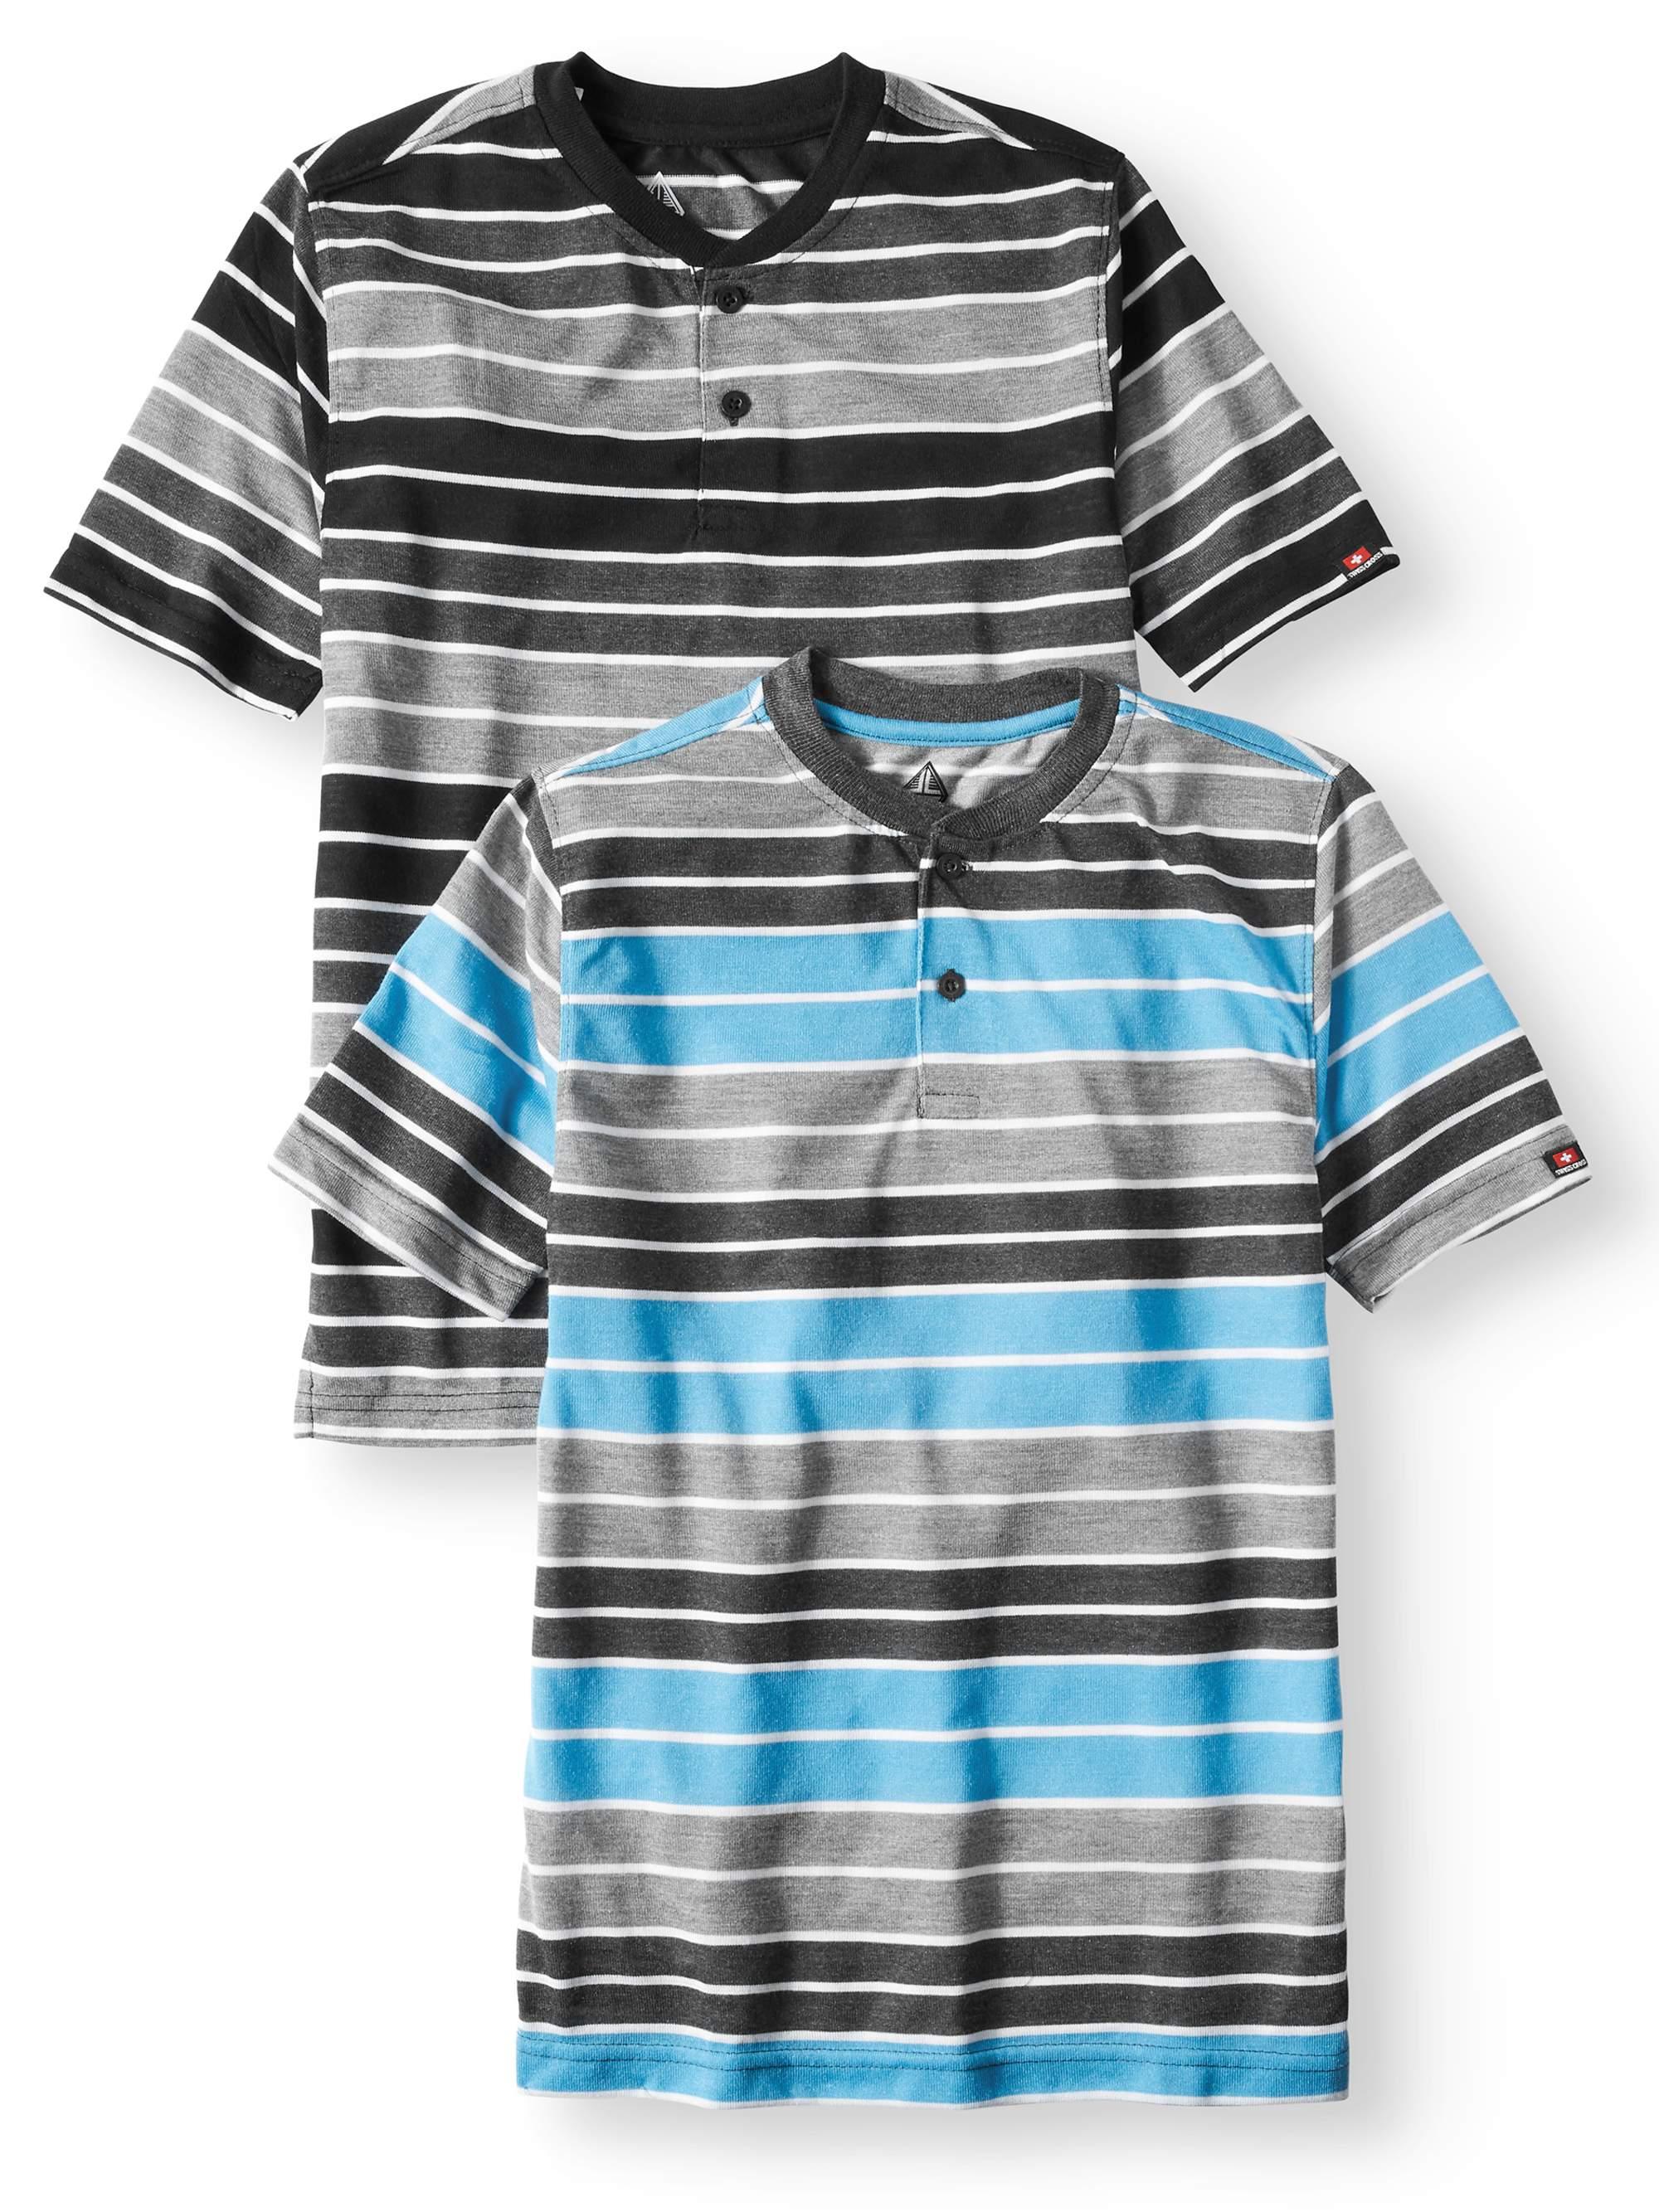 SWISS CROSS Short Sleeve Stripe Crew Neck Jersey Henley Tee, Value 2 Pack (Big Boys)